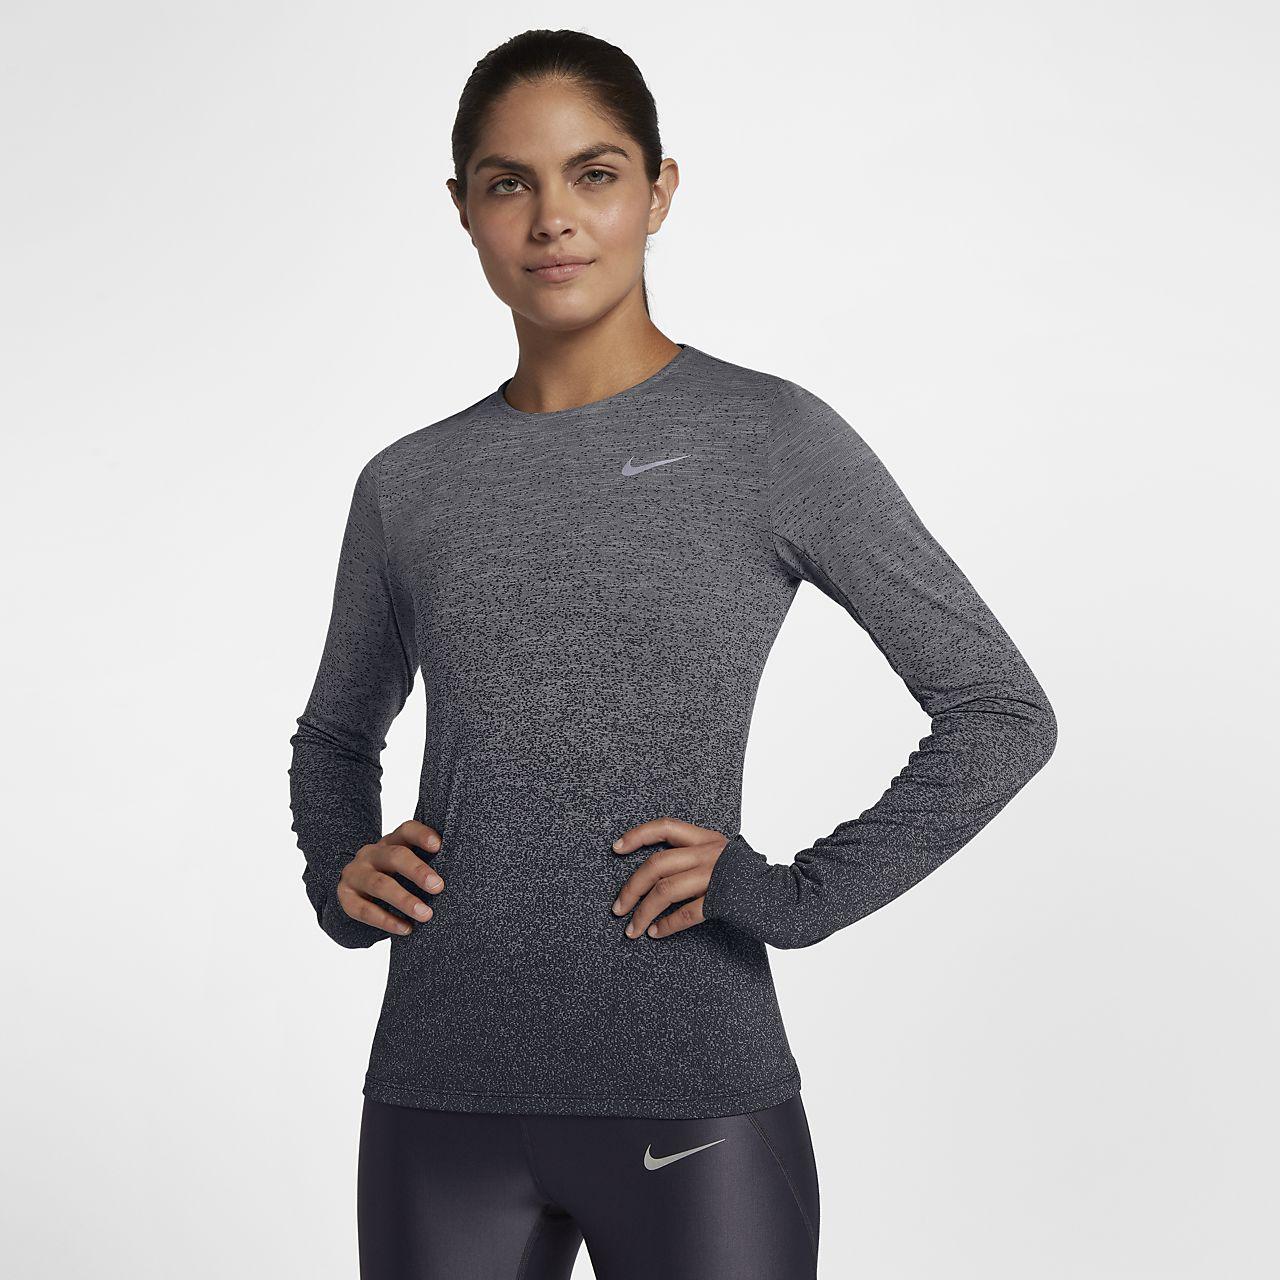 Nike Medalist Women s Long Sleeve Running Top. Nike.com 85feeab77752